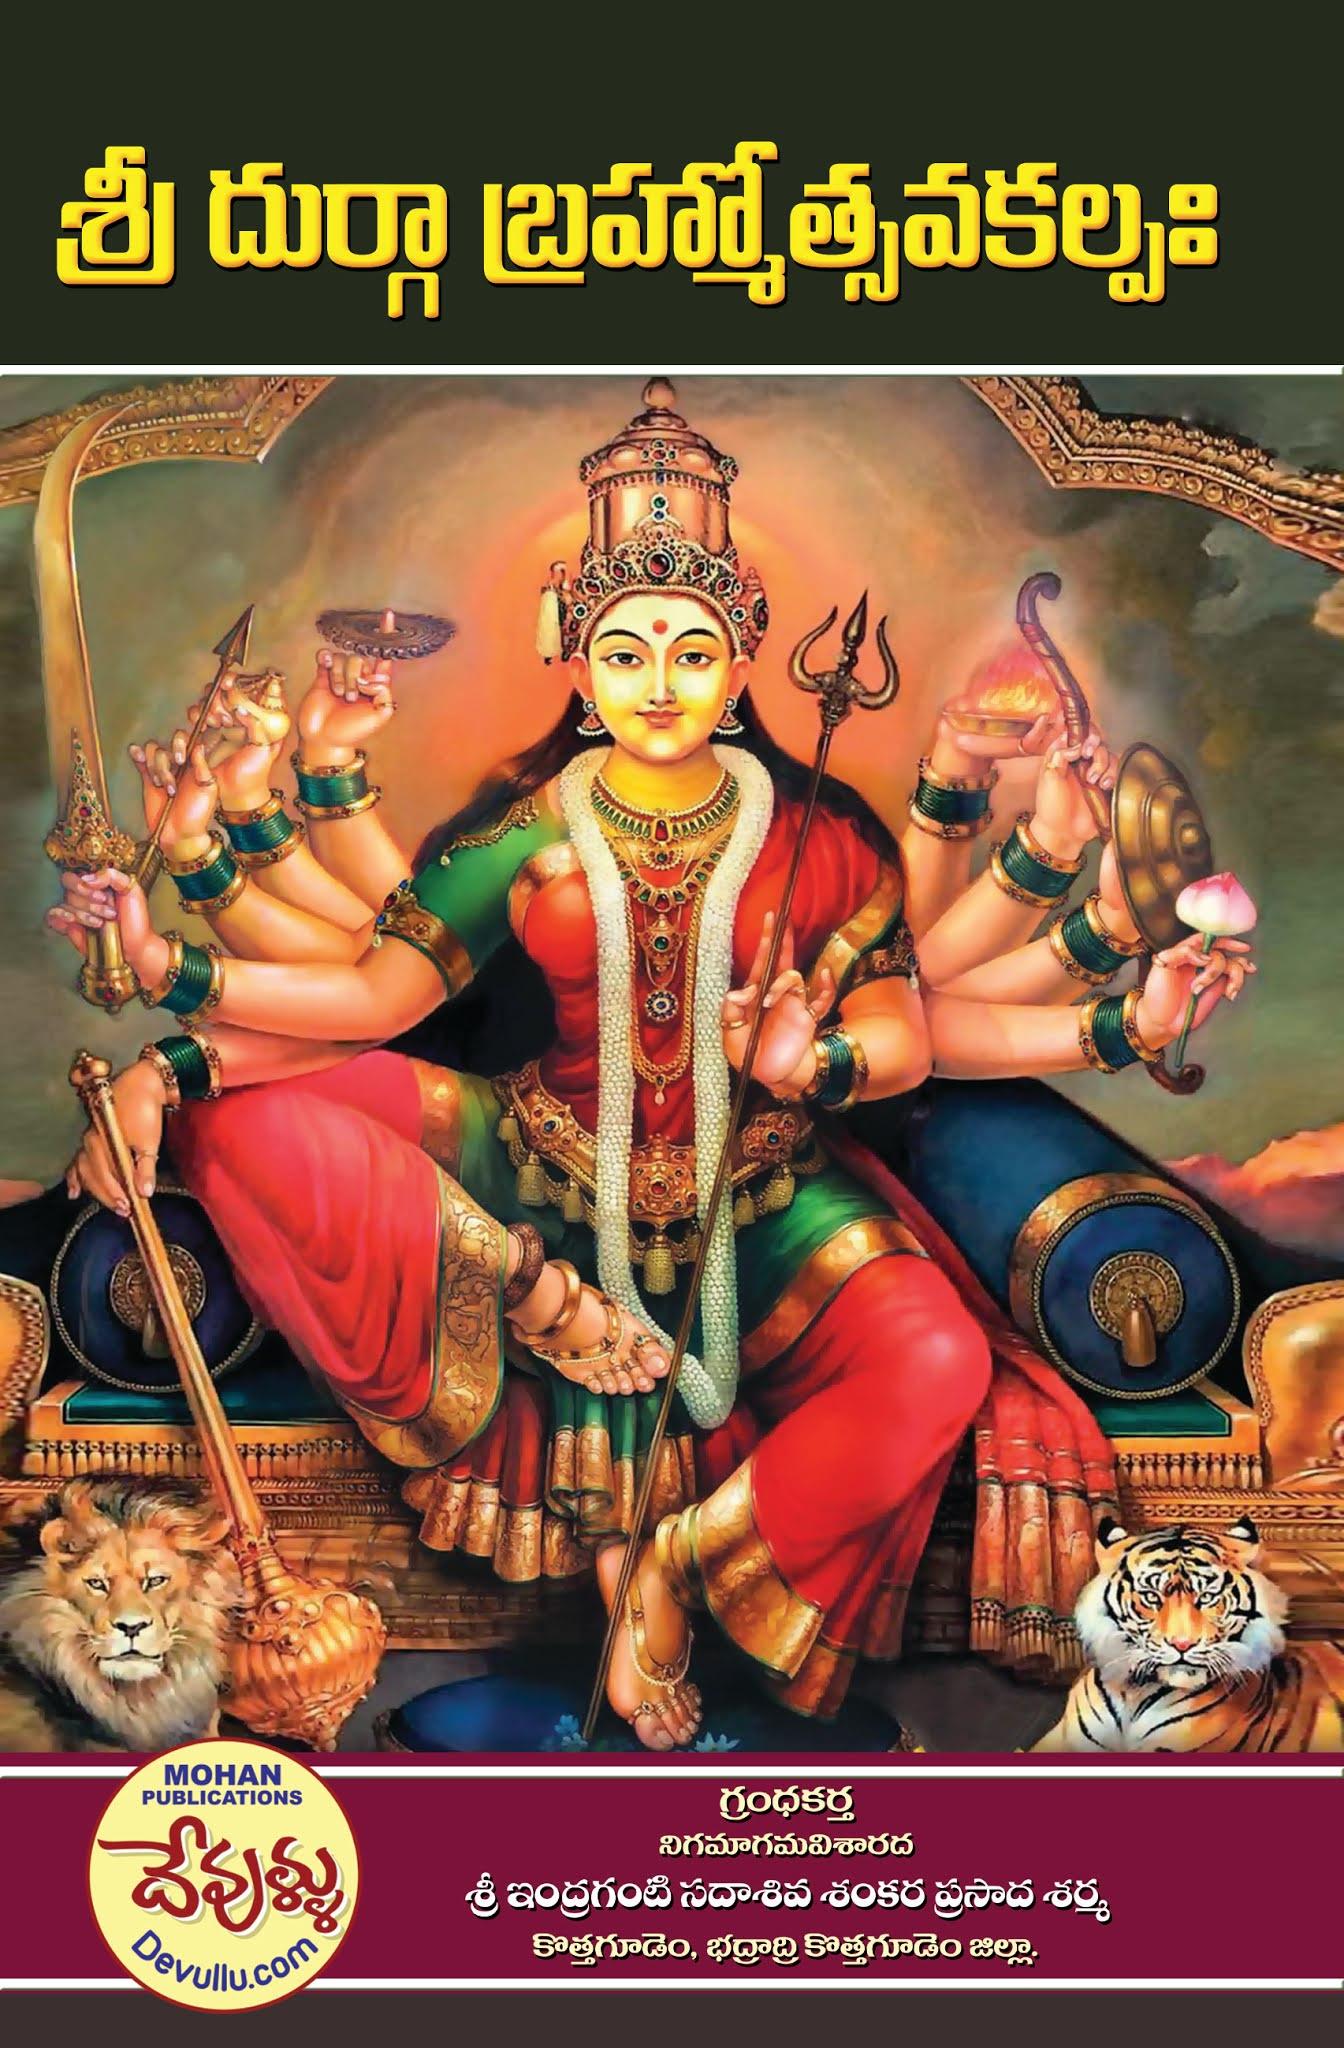 Sri Durga brahmotsava kalpam in telugu | శ్రీ దుర్గా బ్రహ్మోత్సవ కల్పం